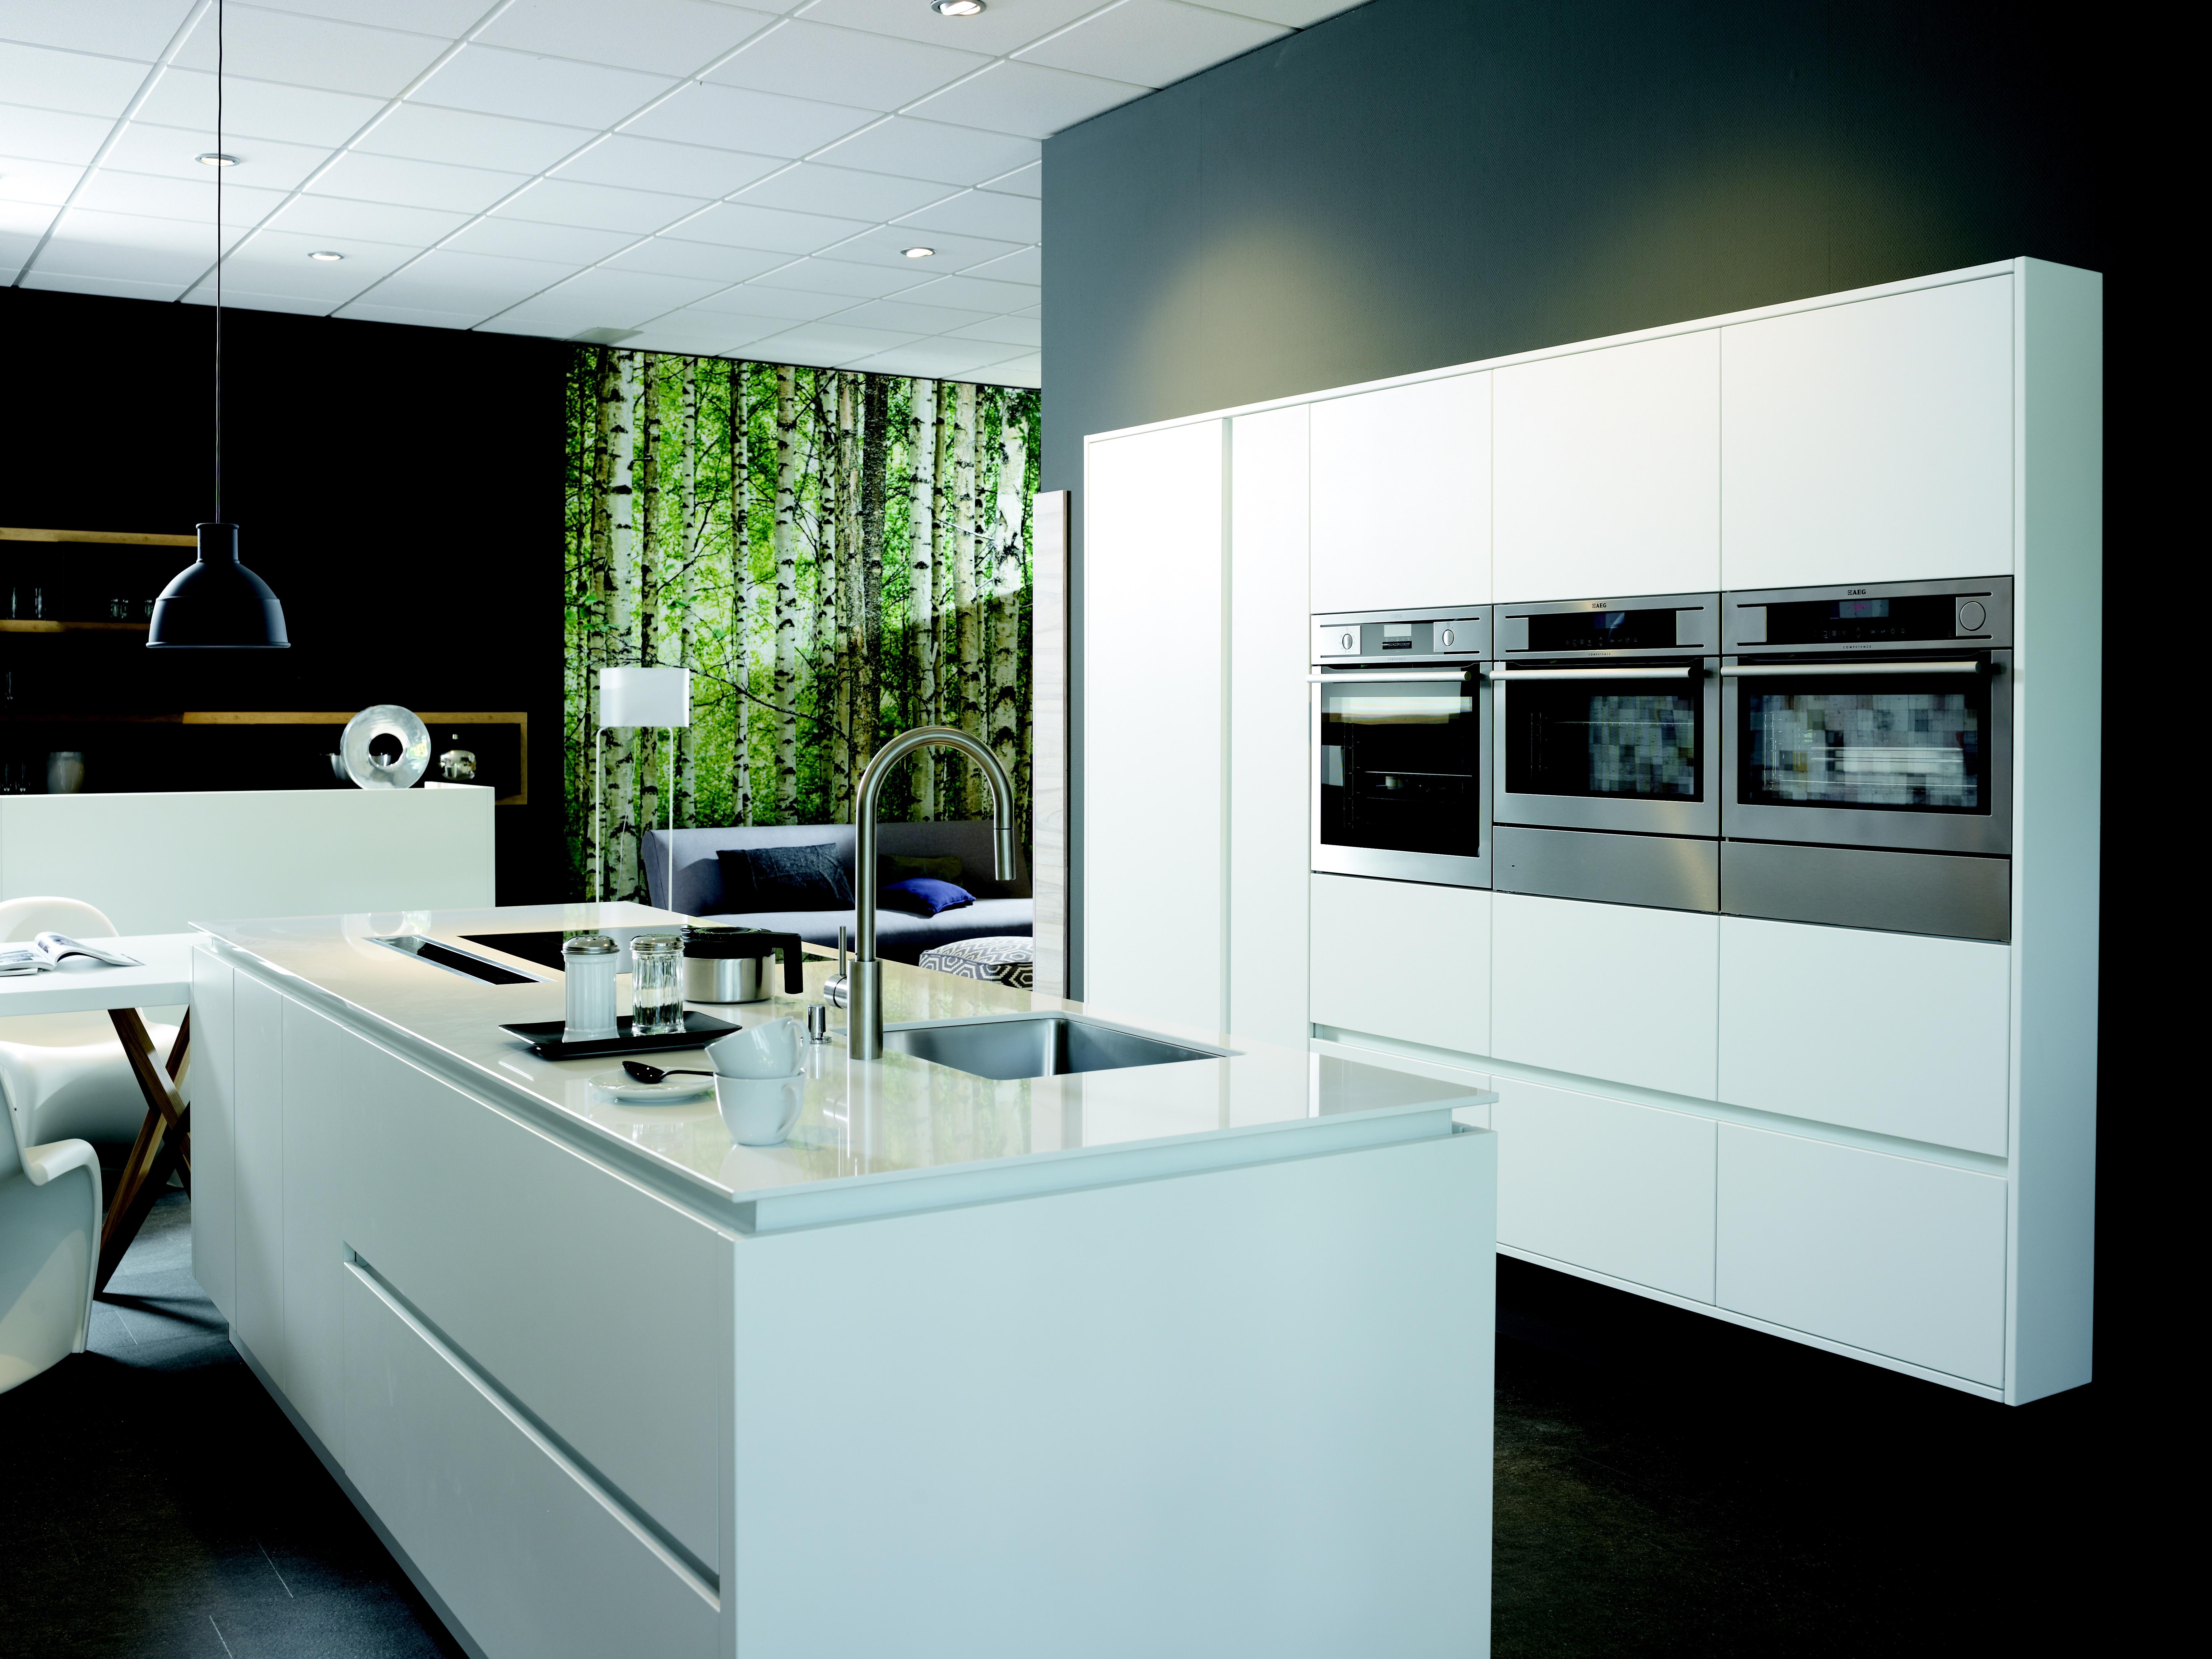 Zwevende keuken en keukenkastjes izaa berichten